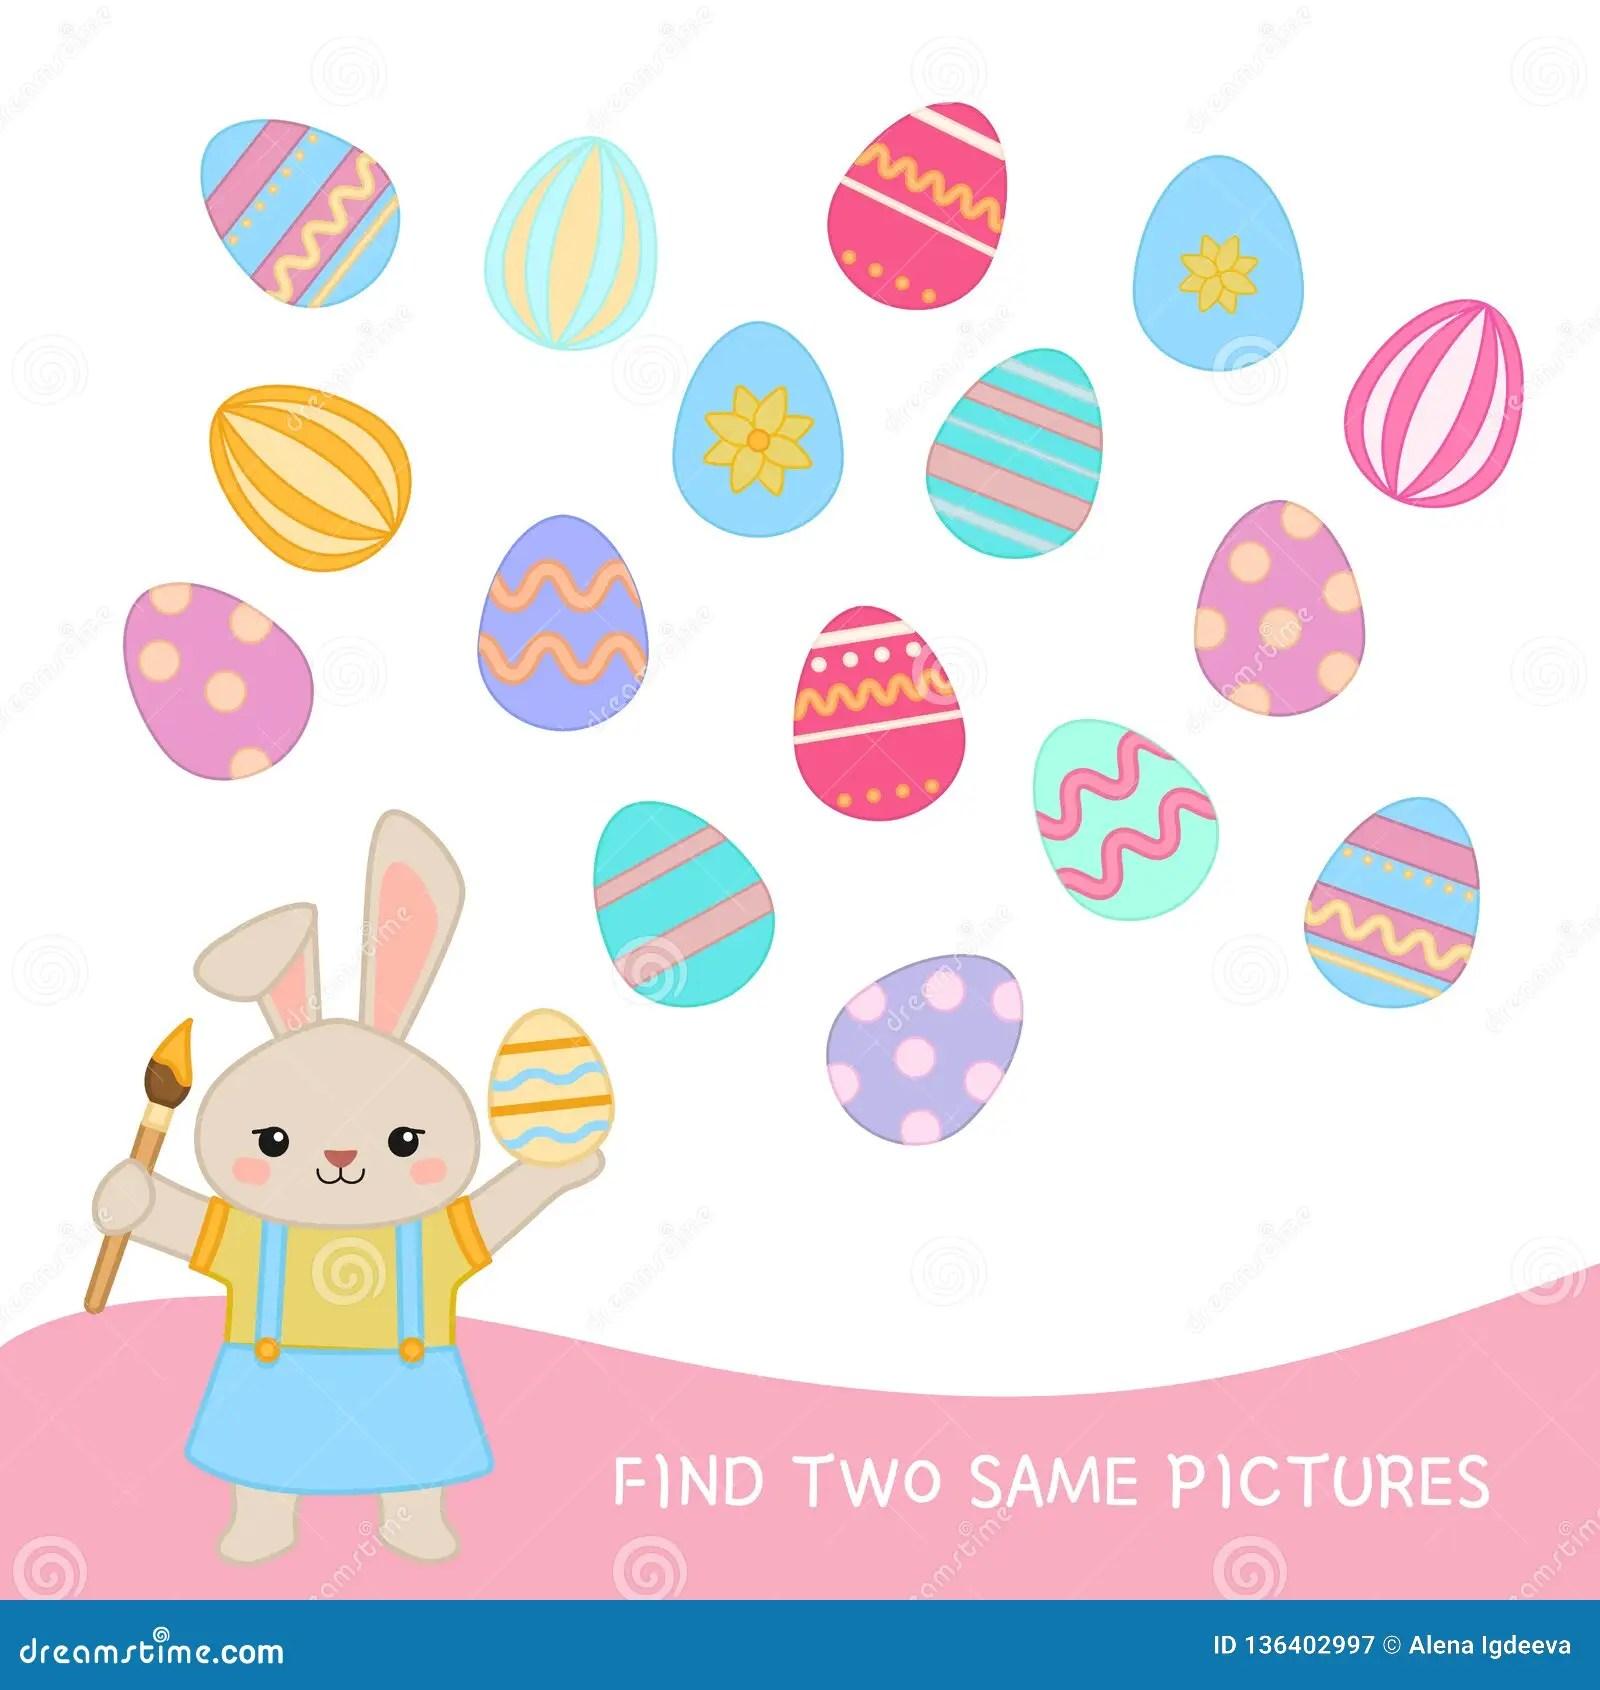 Easter Bunny Childhood Royalty Free Stock Image